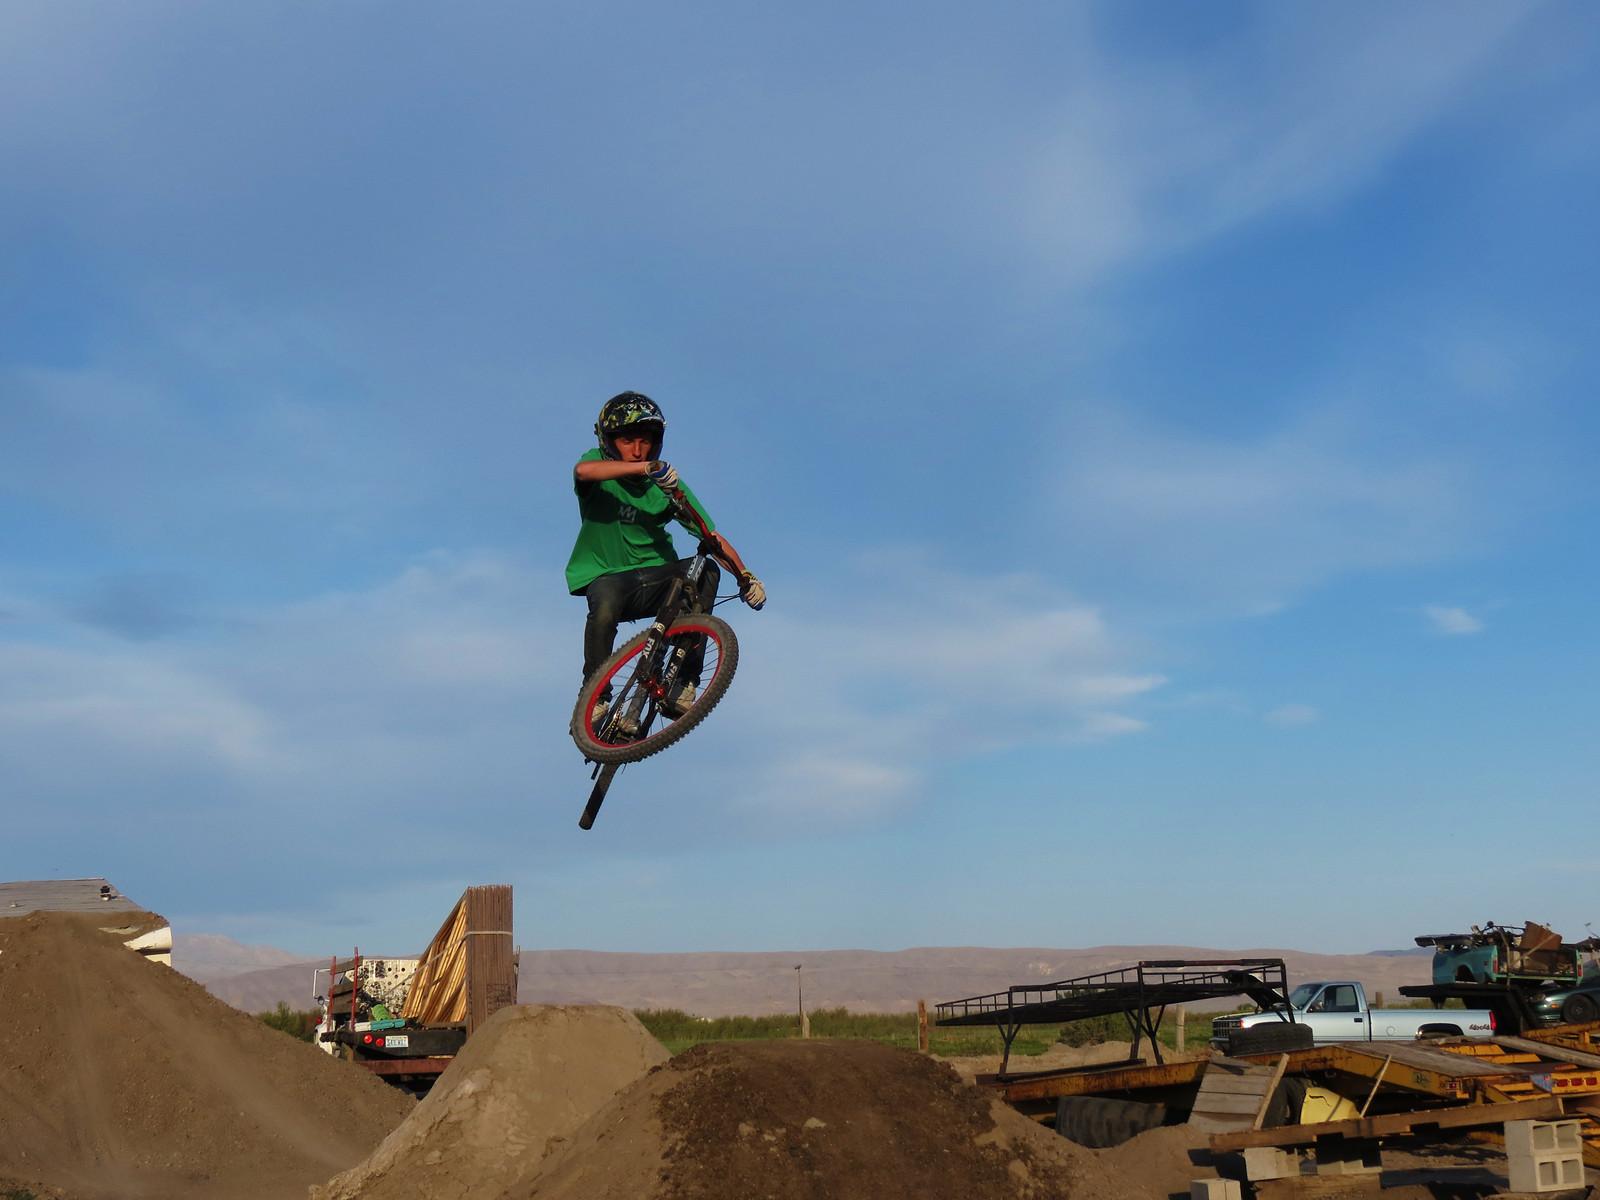 day 4 008 - Moosey - Mountain Biking Pictures - Vital MTB